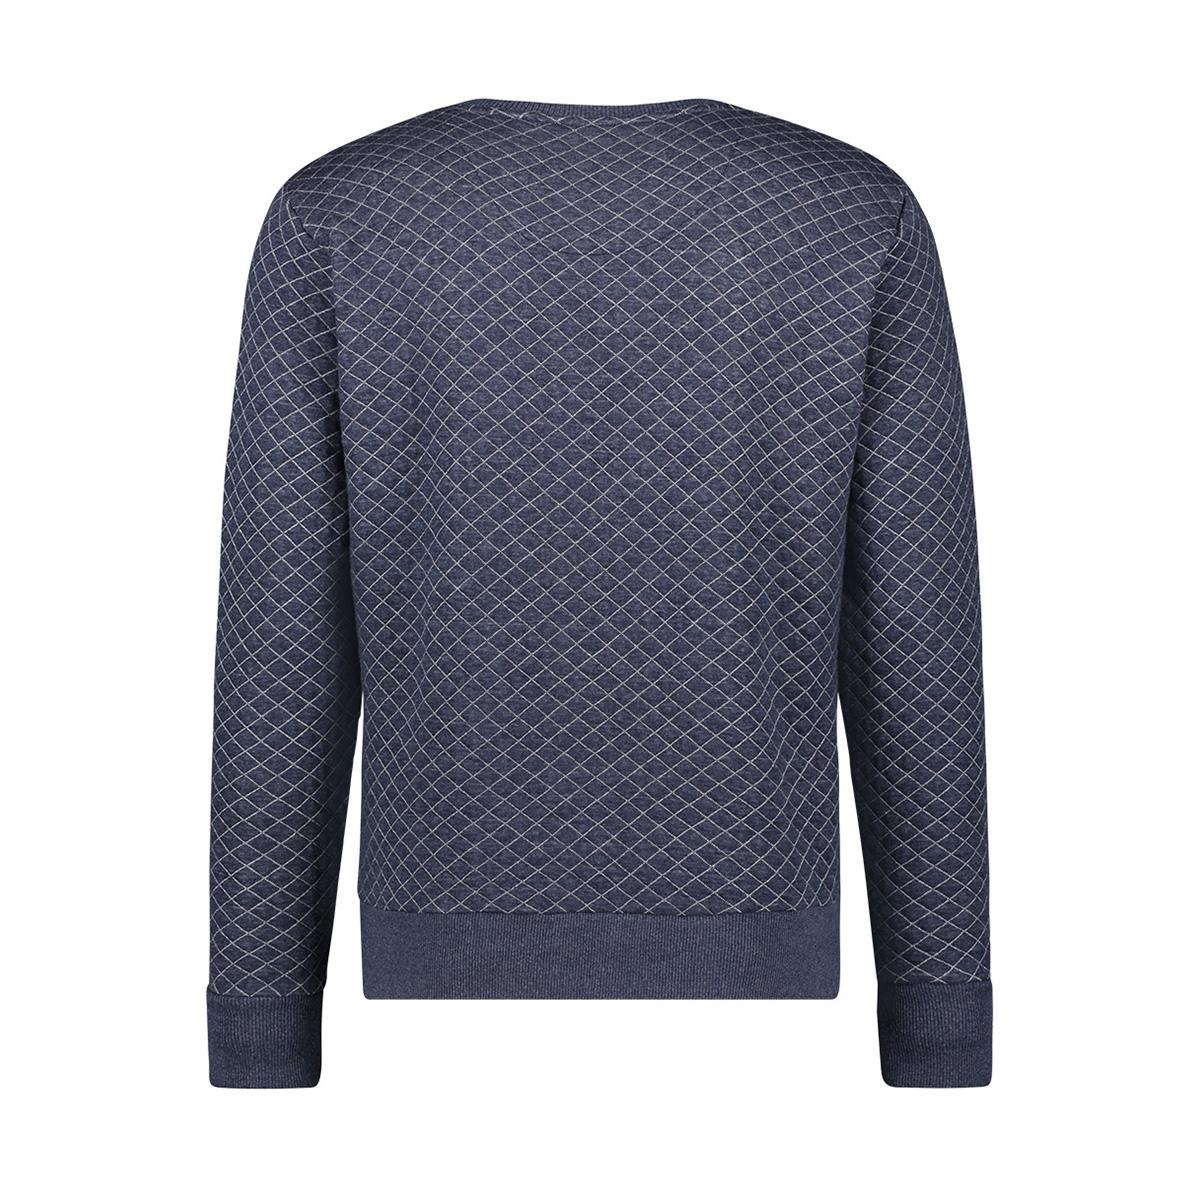 sweat qulted mu12 0402 haze & finn sweater dark navy melange